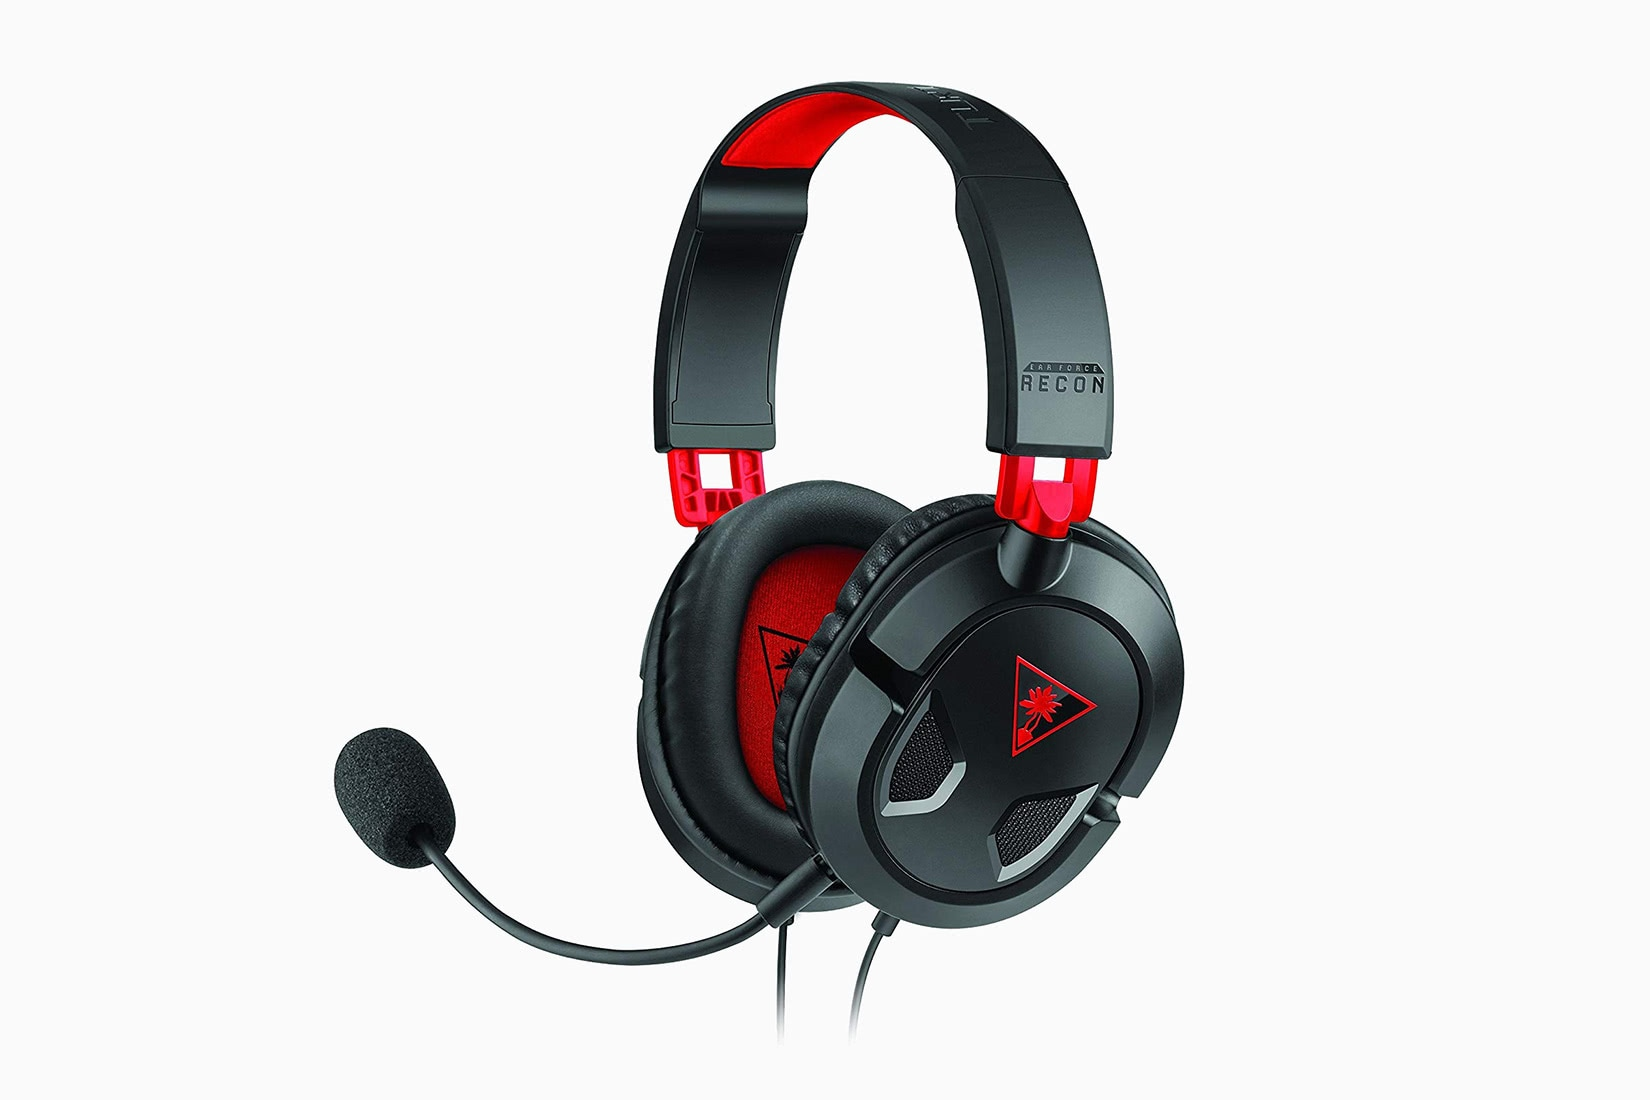 best over-ear headphones turtle beach ear force recon 50 review - Luxe Digital